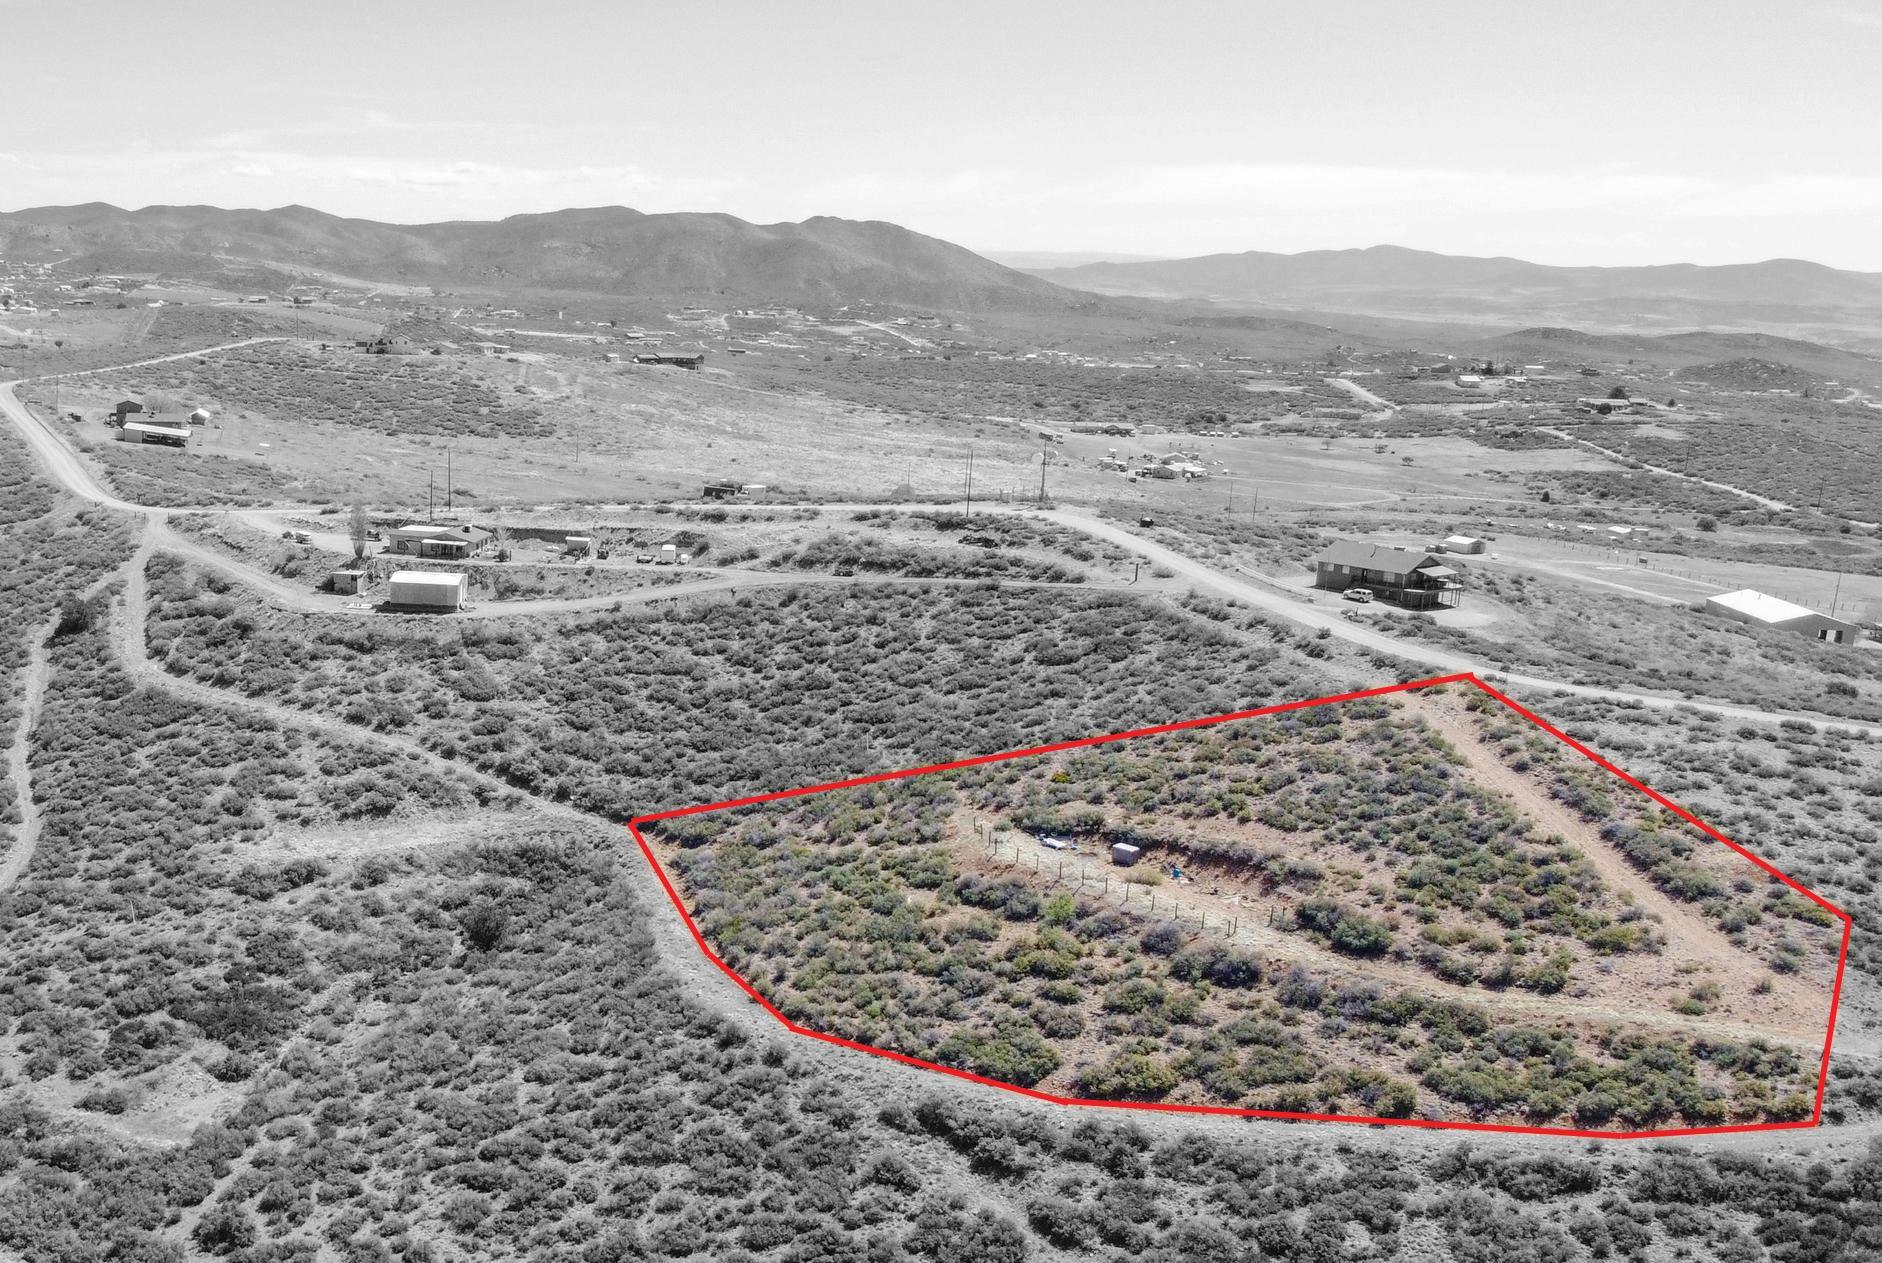 Photo of 0 Rabbit Ridge Rd - 402-15-014p #Lot: 014P, Dewey-Humboldt, AZ 86327 (MLS # 1037675)